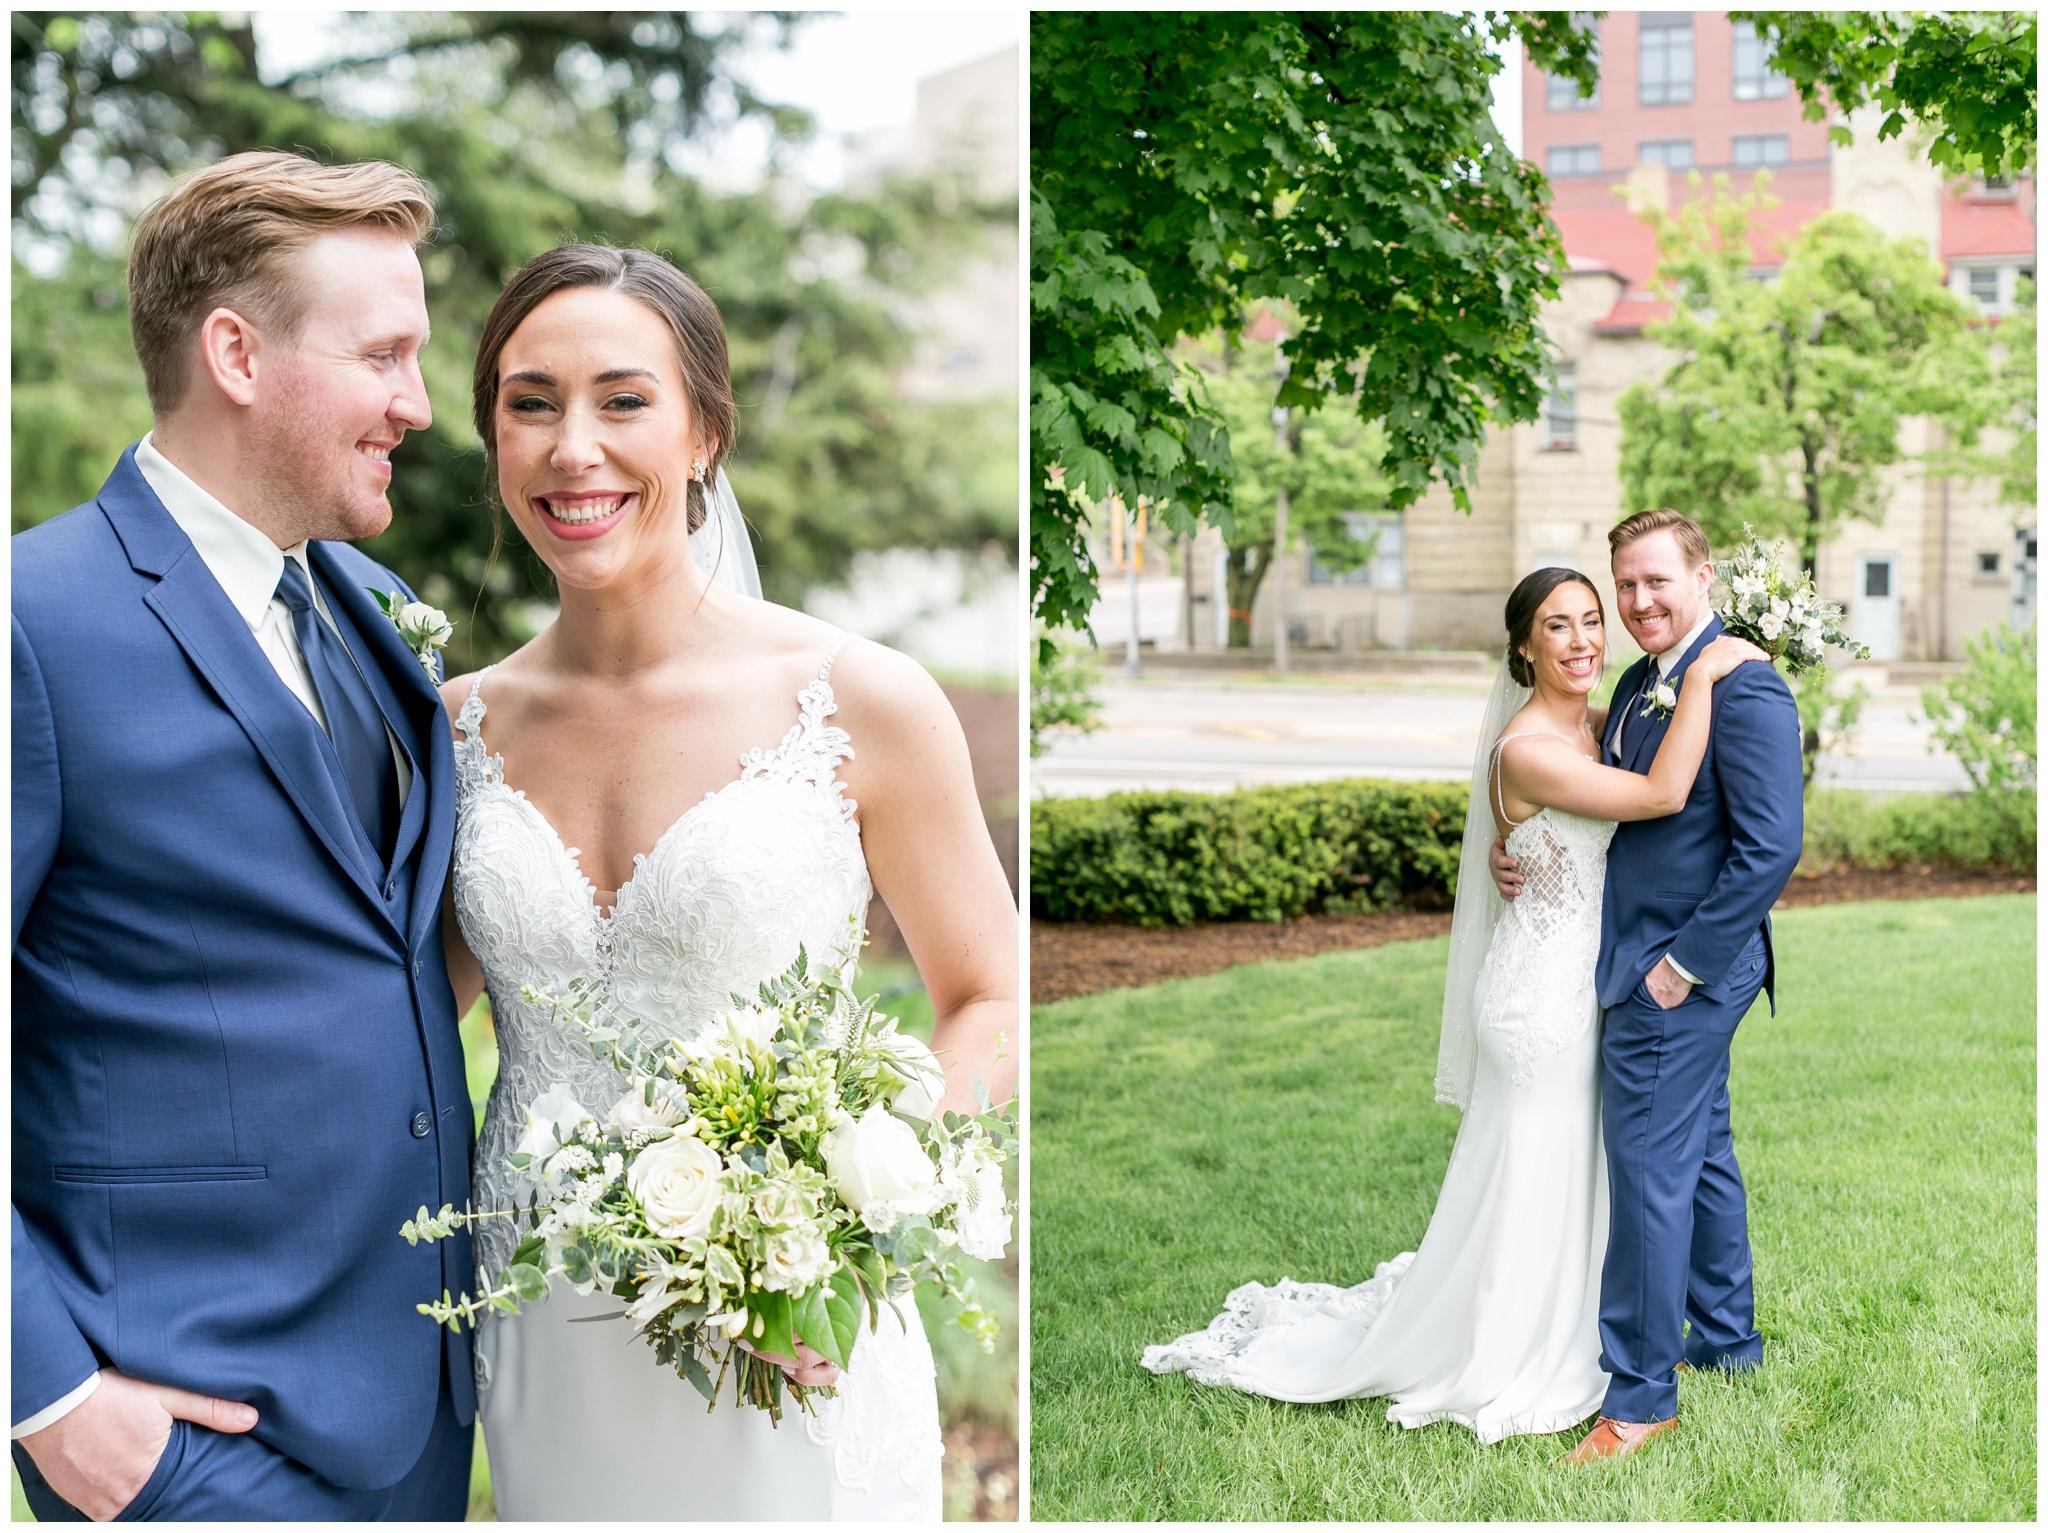 Union_south_Wedding_Madison_Wisconsin_Caynay_Photo_3638.jpg